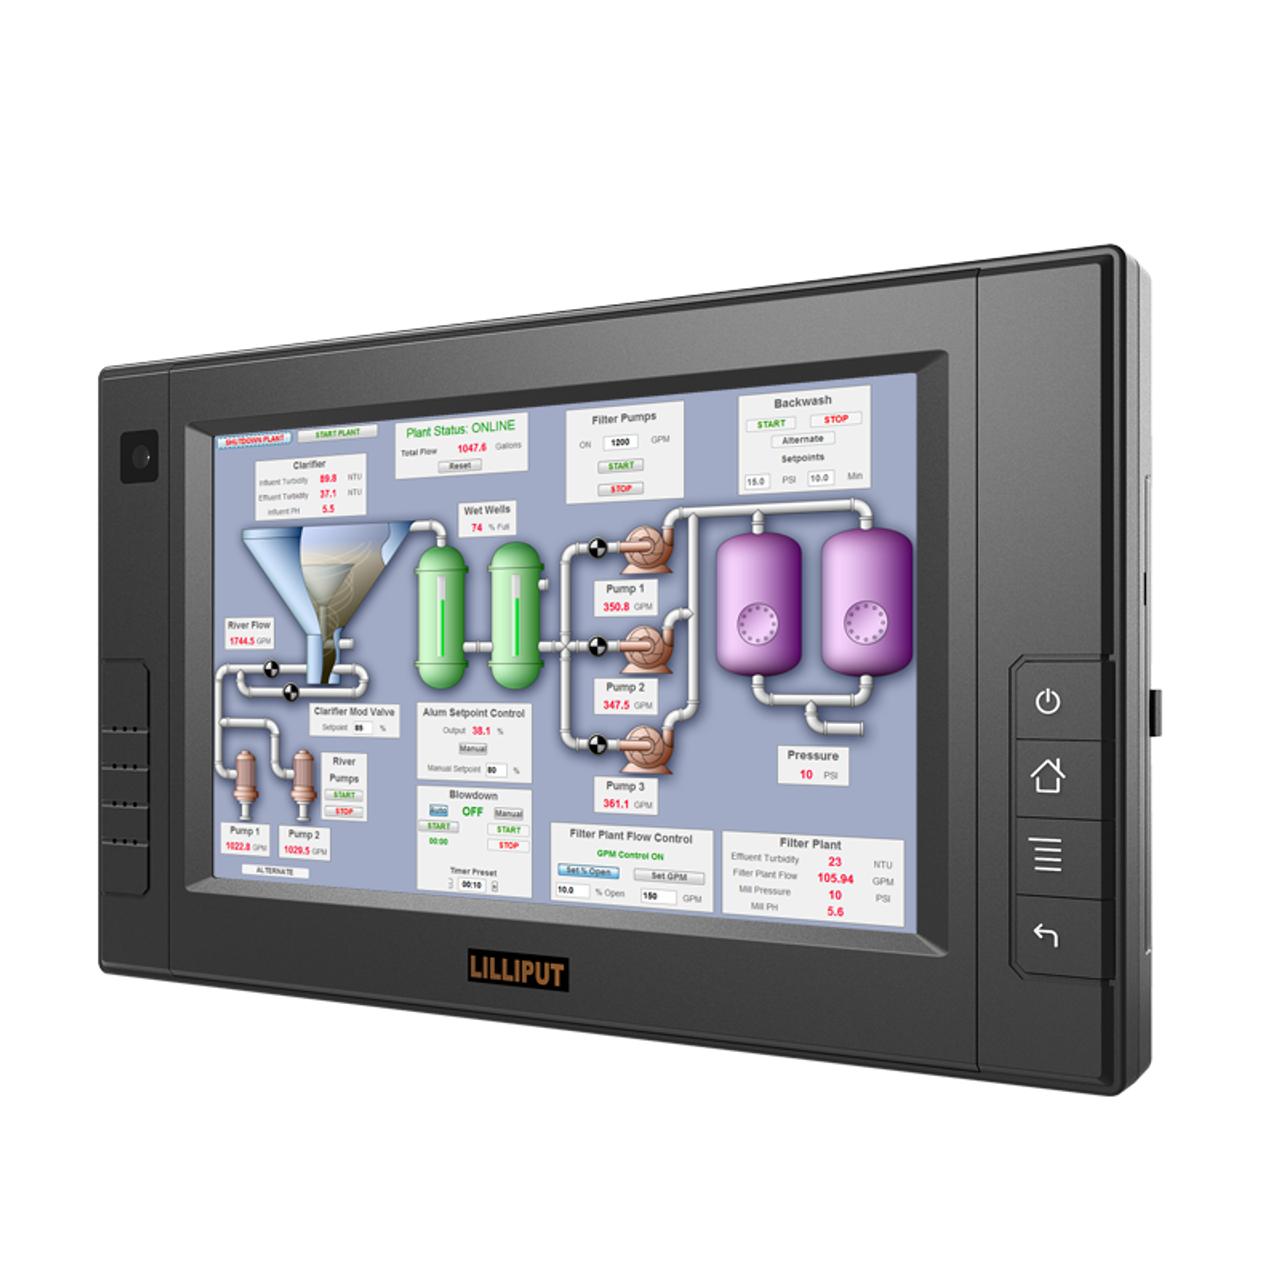 PC-7106 7 INCH MOBILE DATA TERMINAL